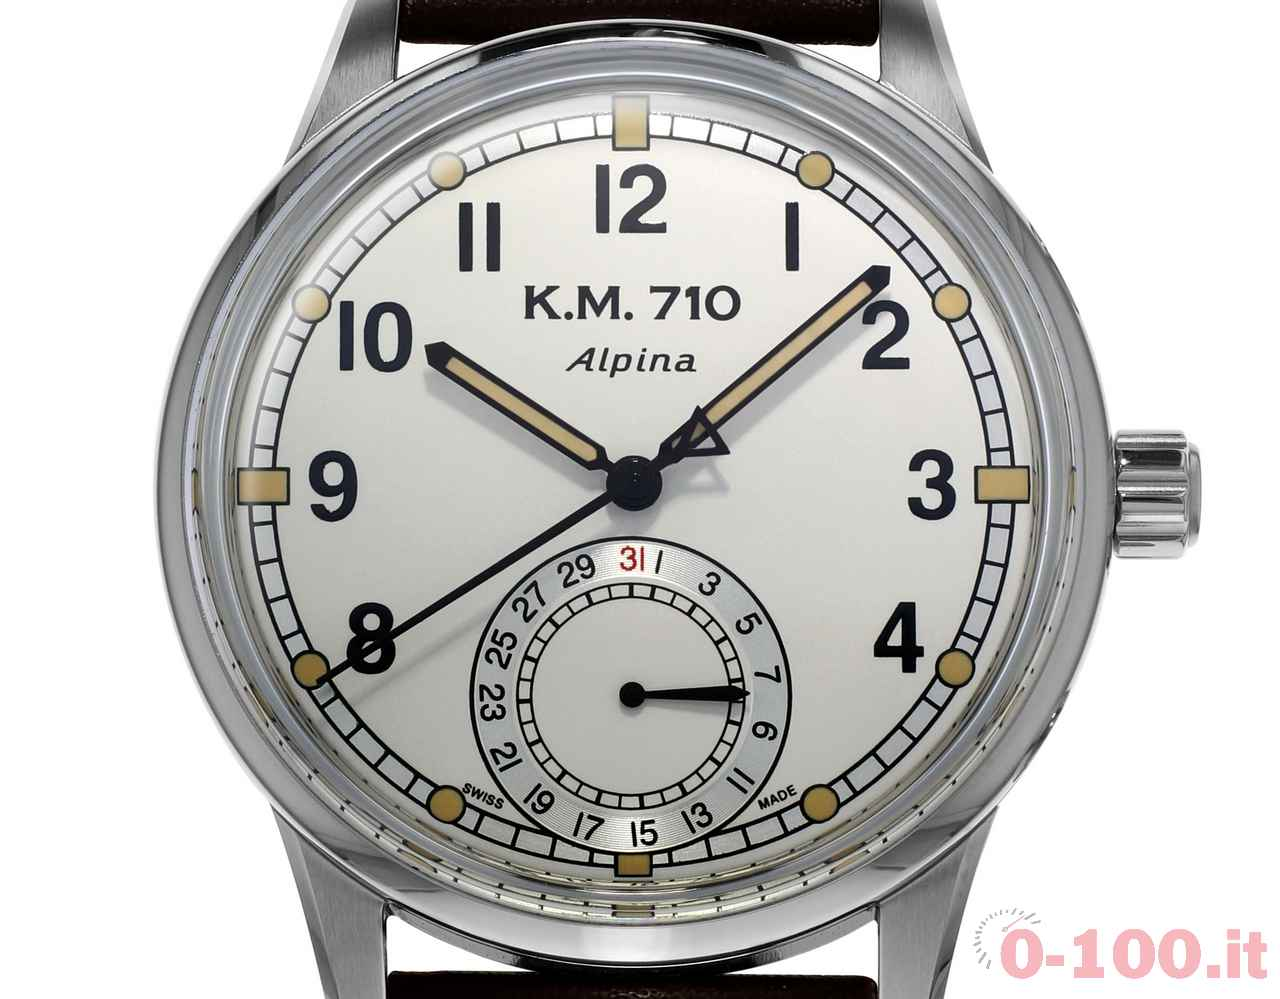 Alpina KM-710 Ref. AL-710KMV4E6